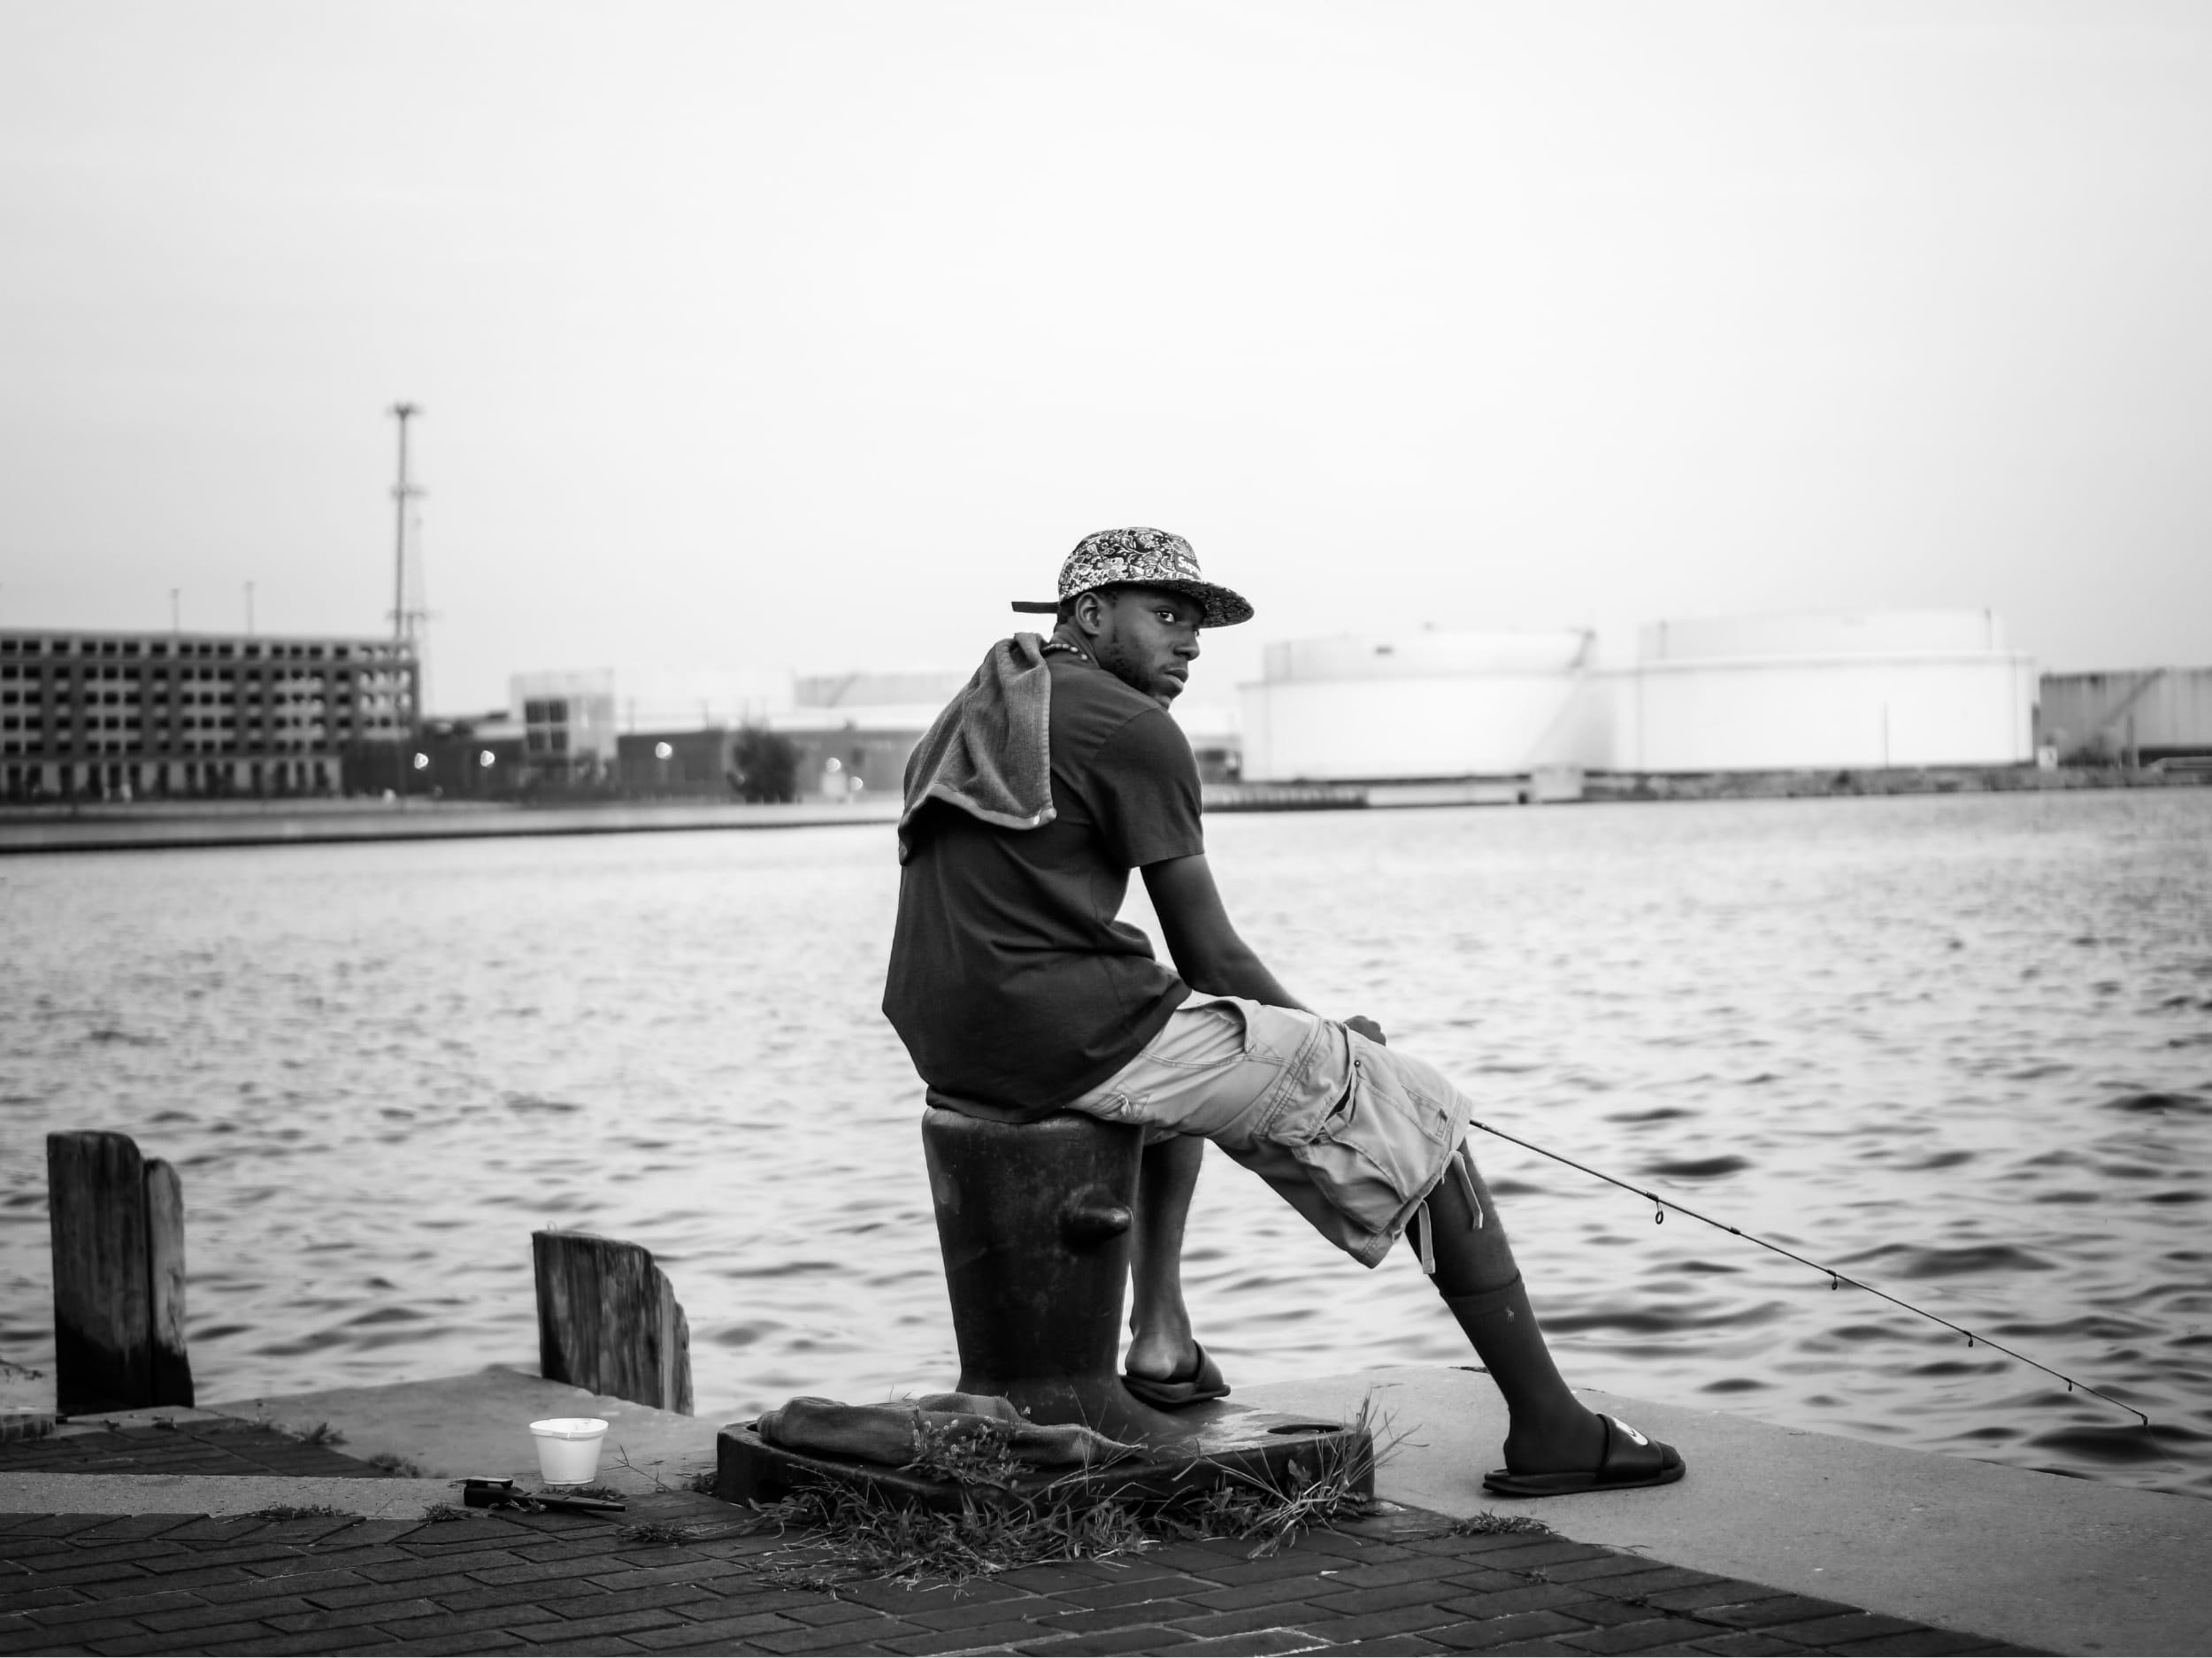 Canton Fisherman